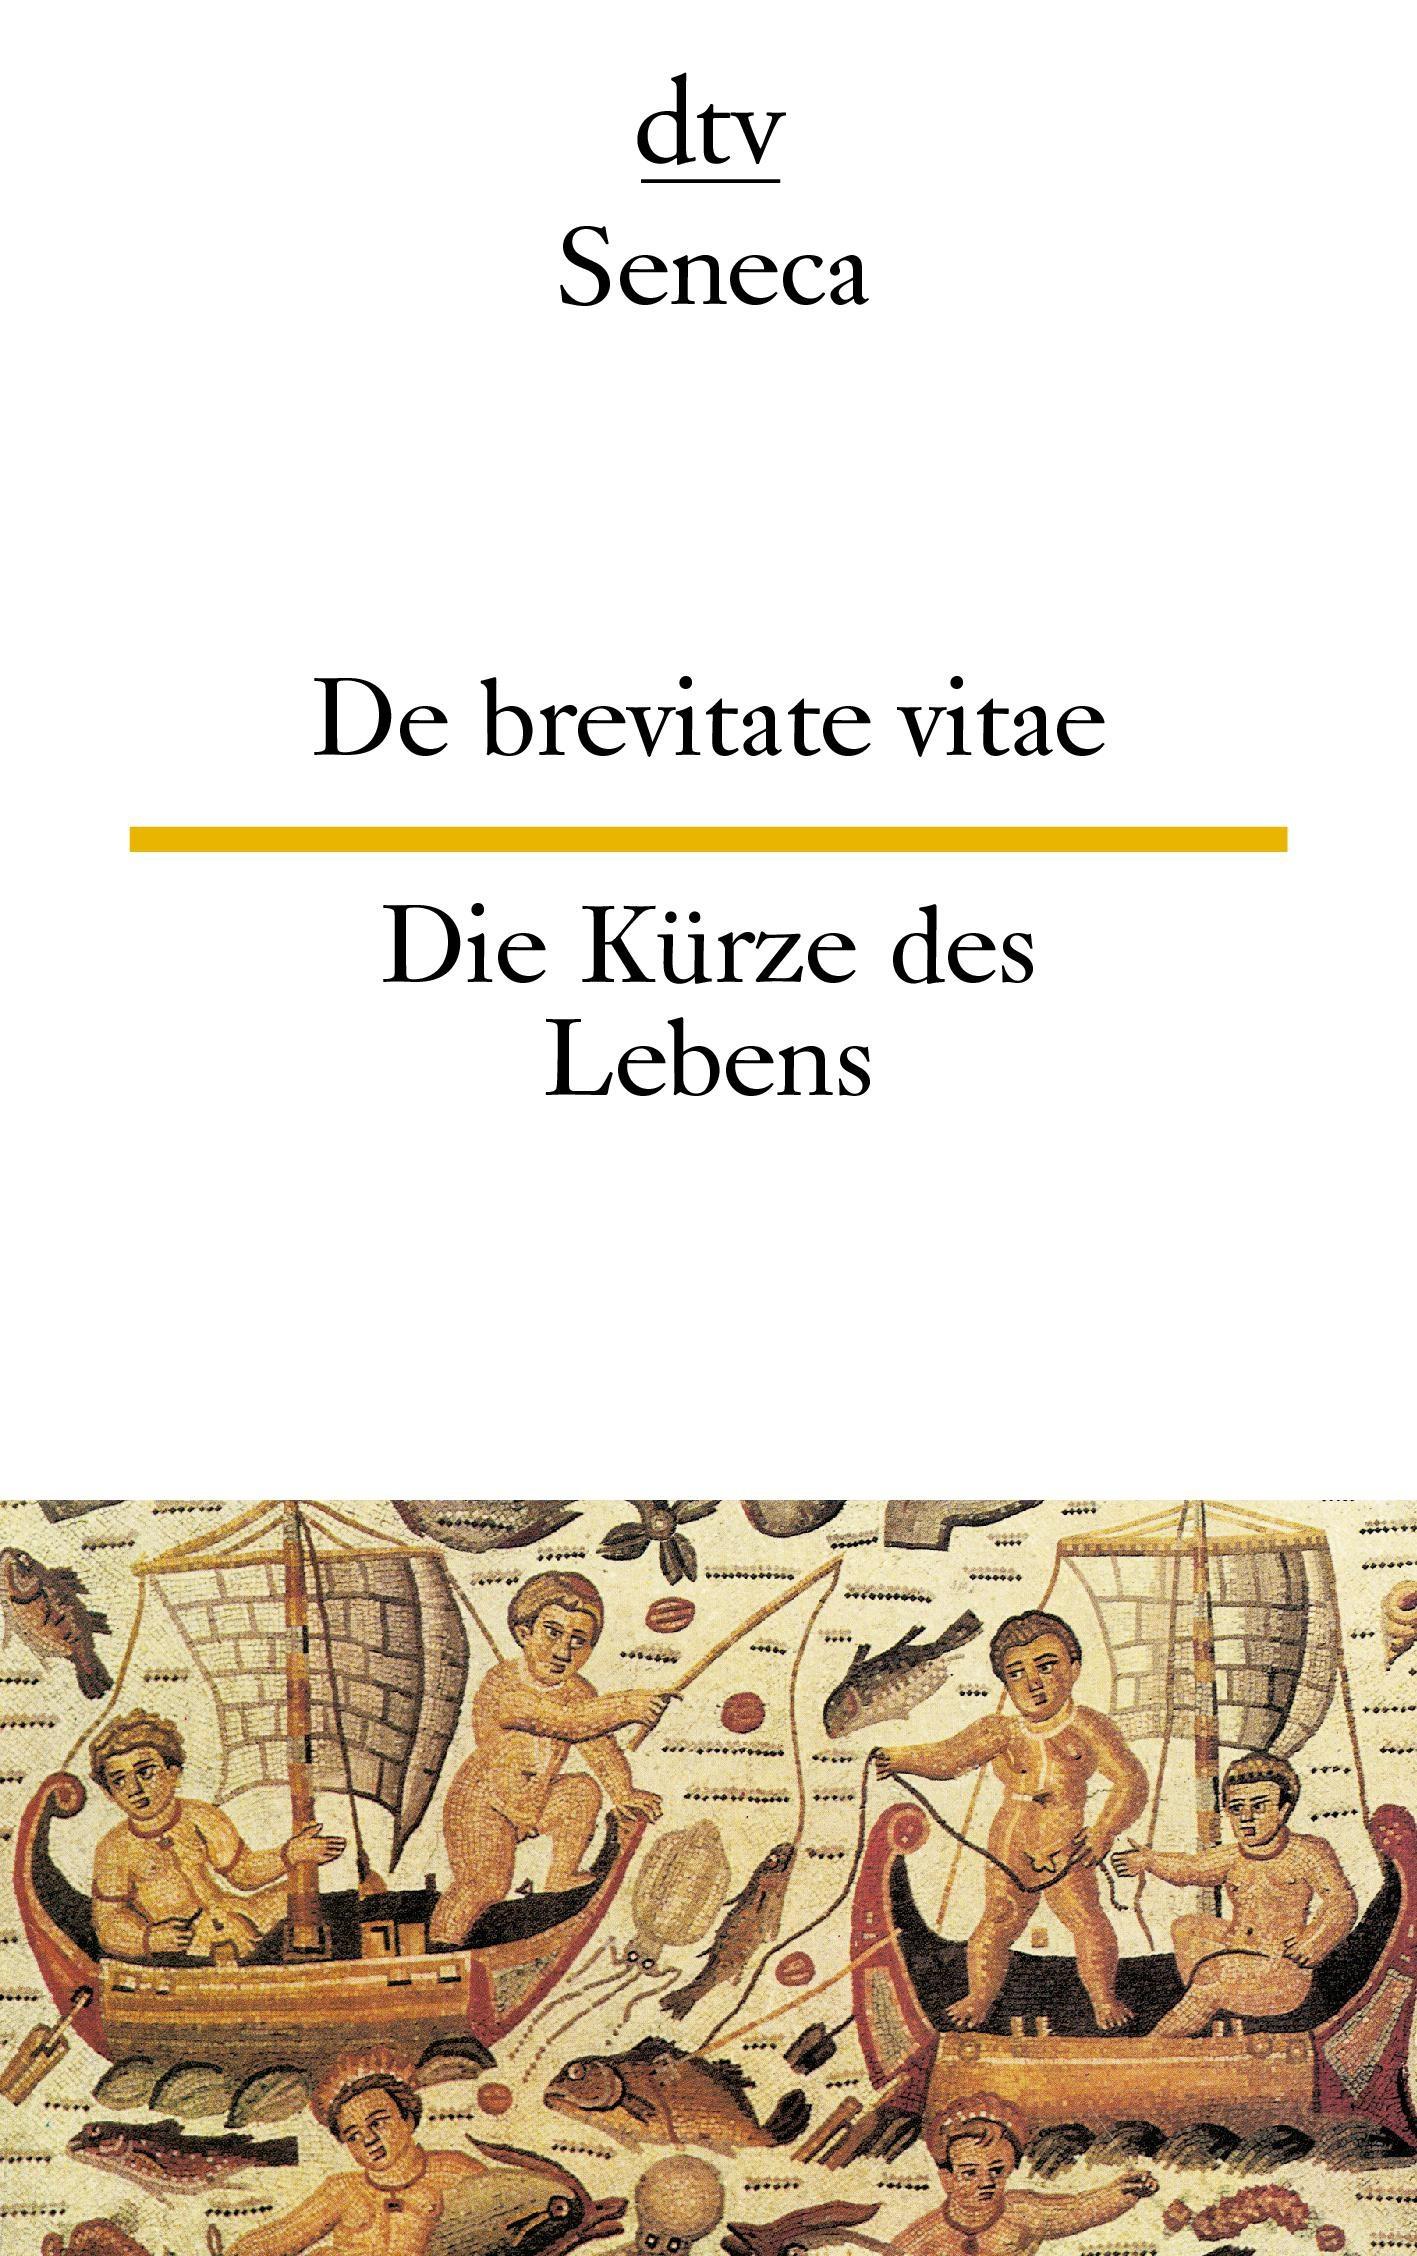 Die Kürze des Lebens / De brevitate vitae